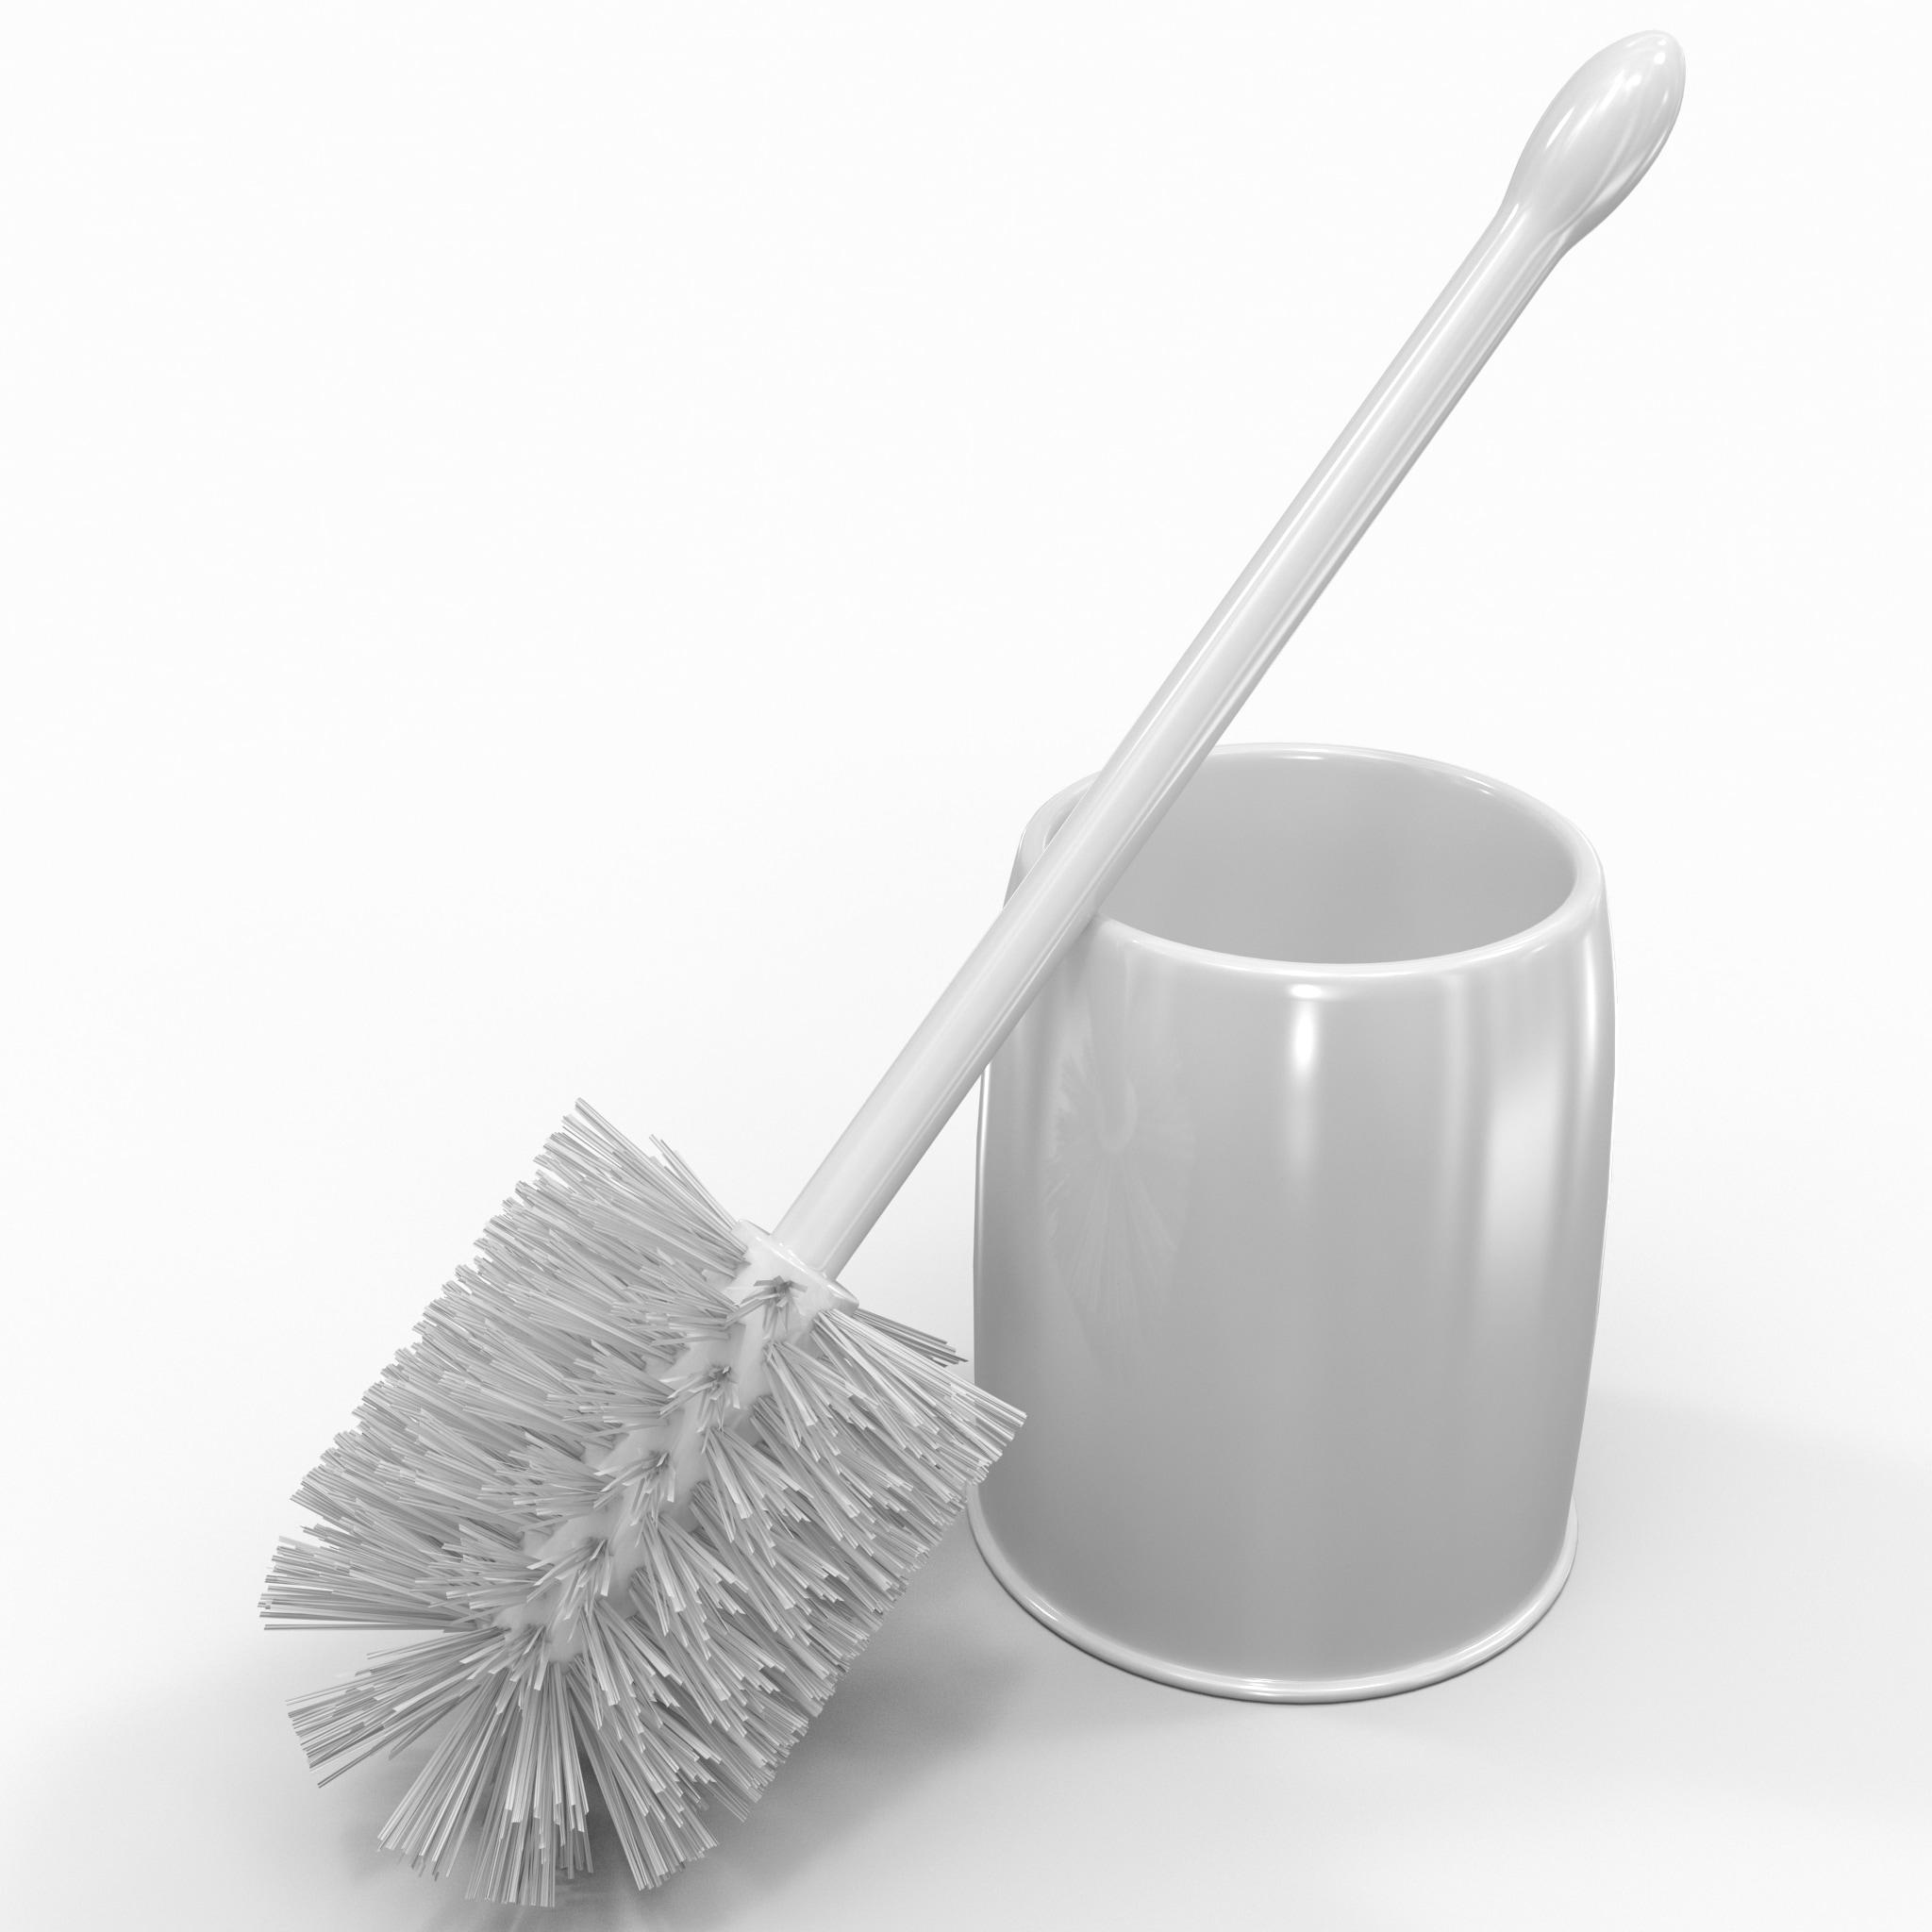 casabella bowl brush set 3d model